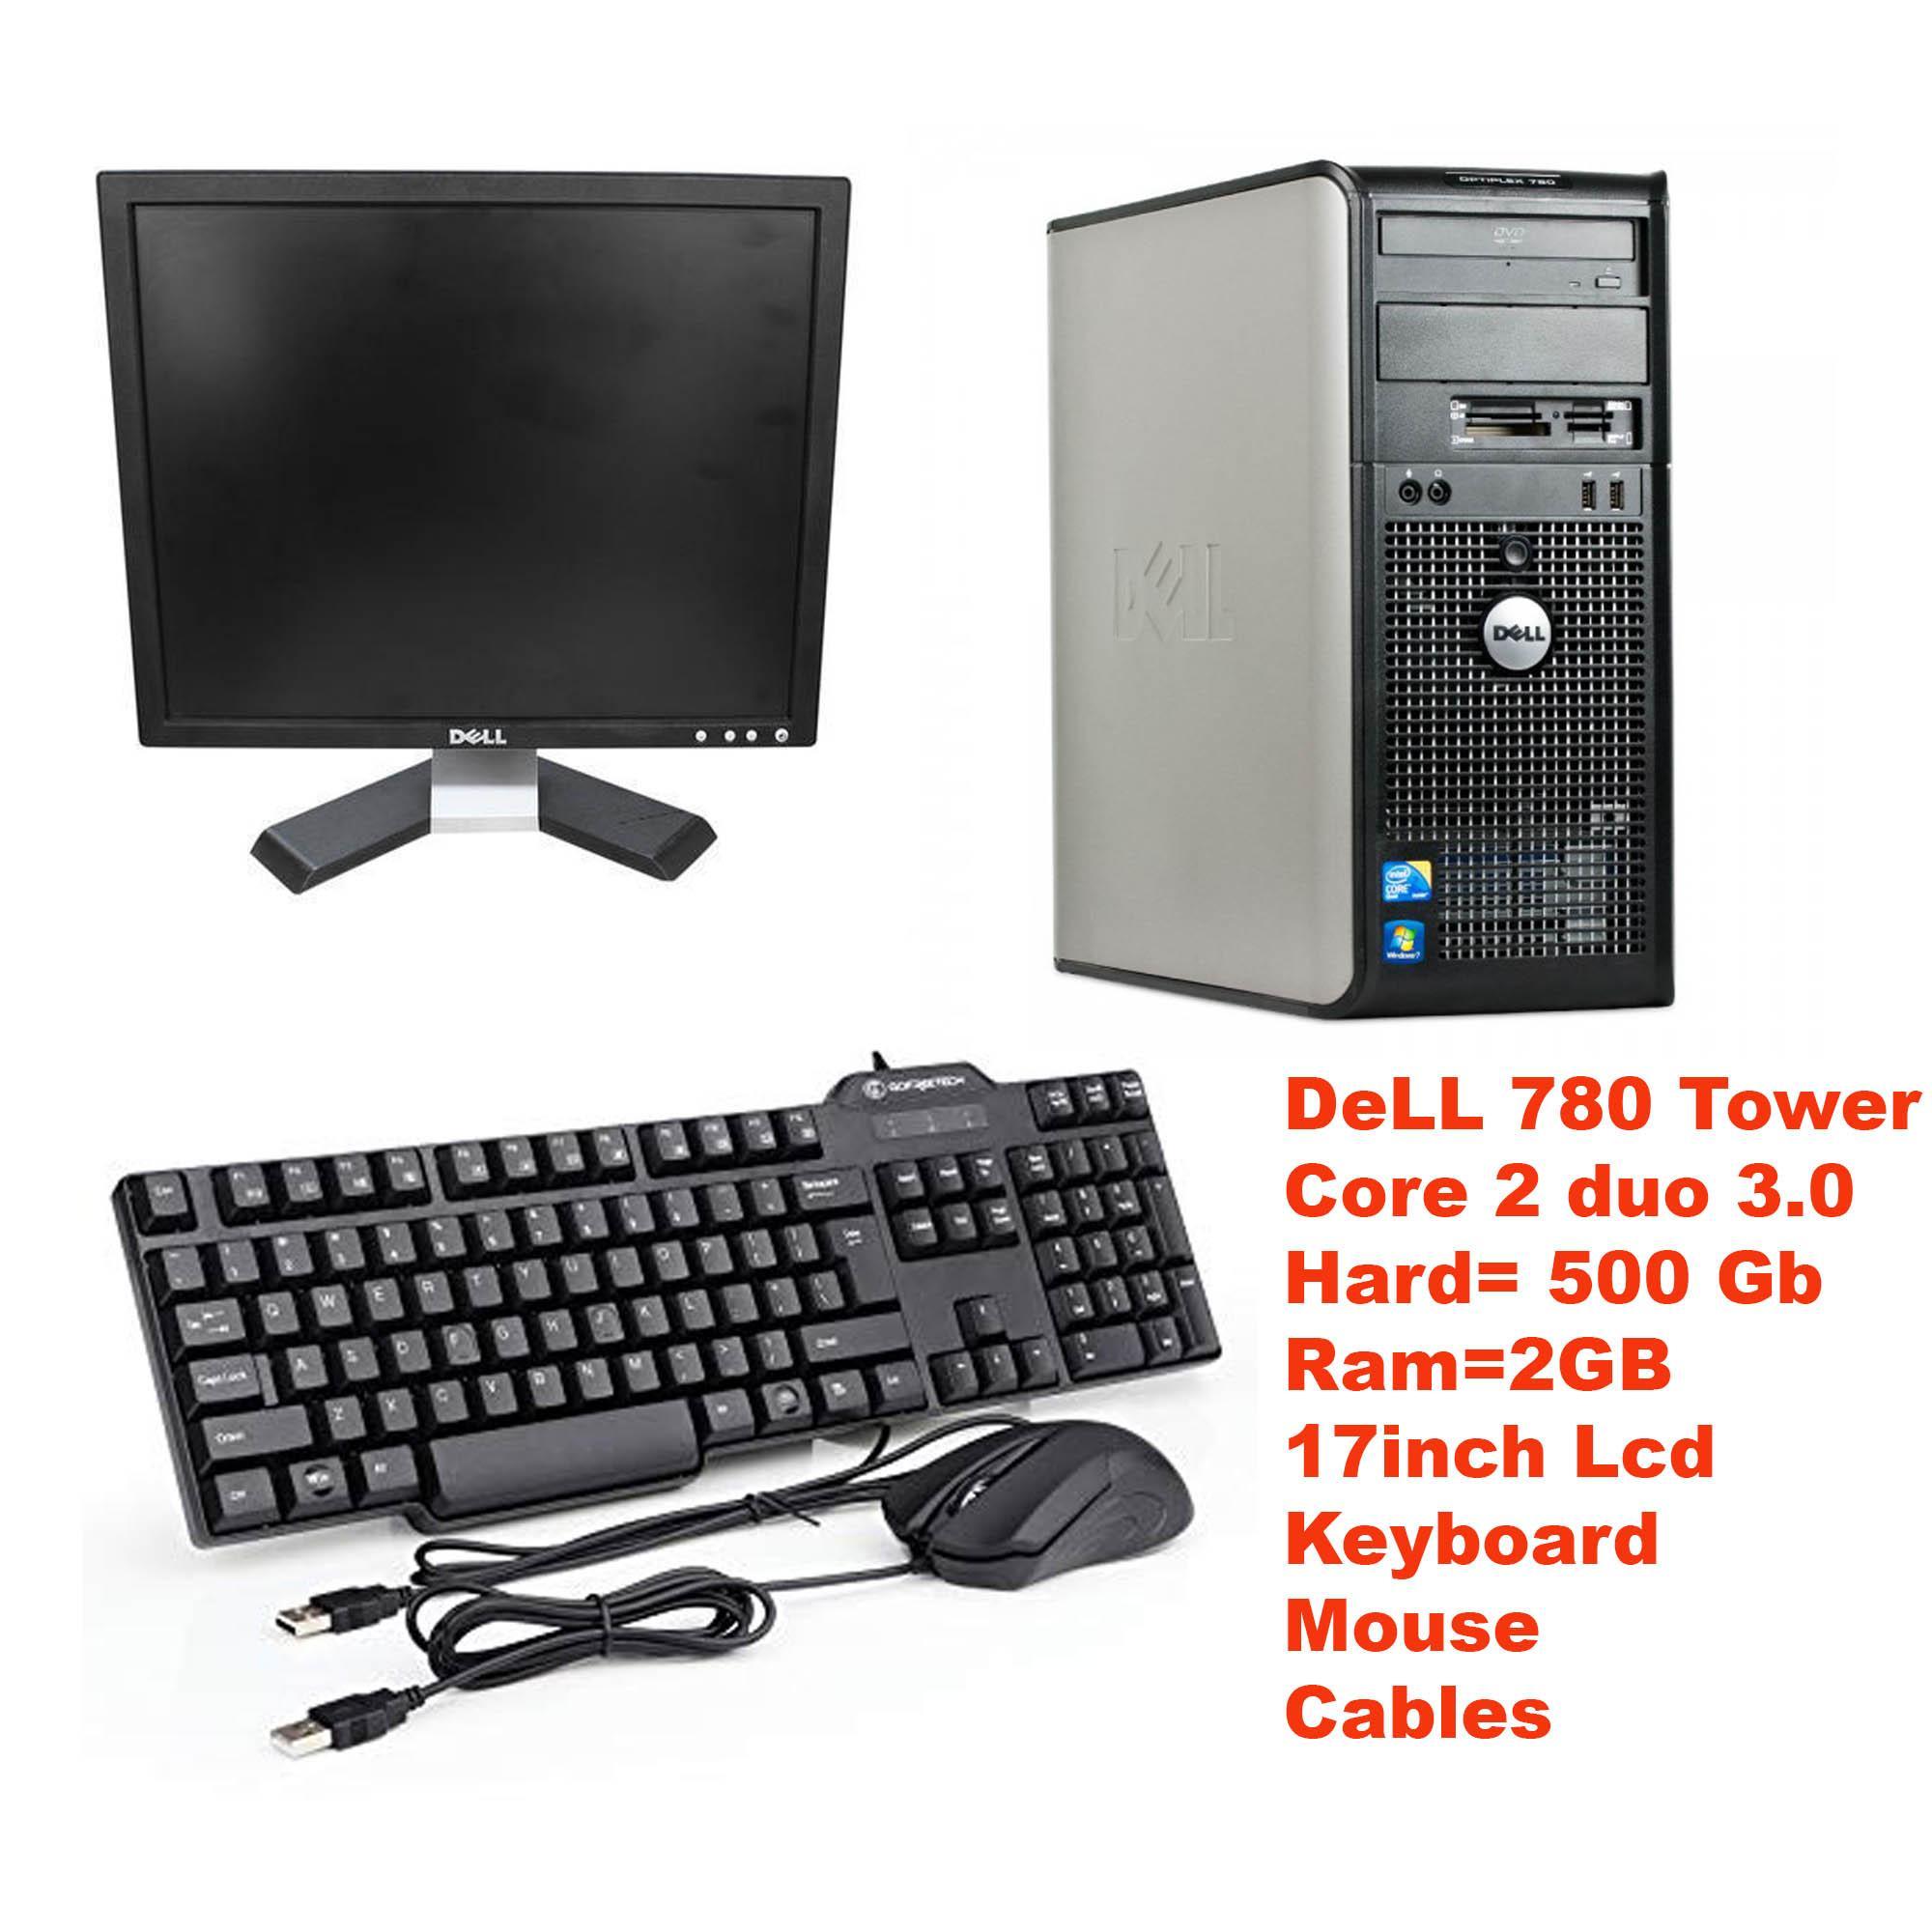 OptiPlex 780/380 USFF Tower Intel Core 2 Duo 3 0 GHz 2 GB RAM 500 GB HD DVD  Win 10 Pro 64-Bit + Dell 17 LCD + Dell Mouse & Keyboard - Black -